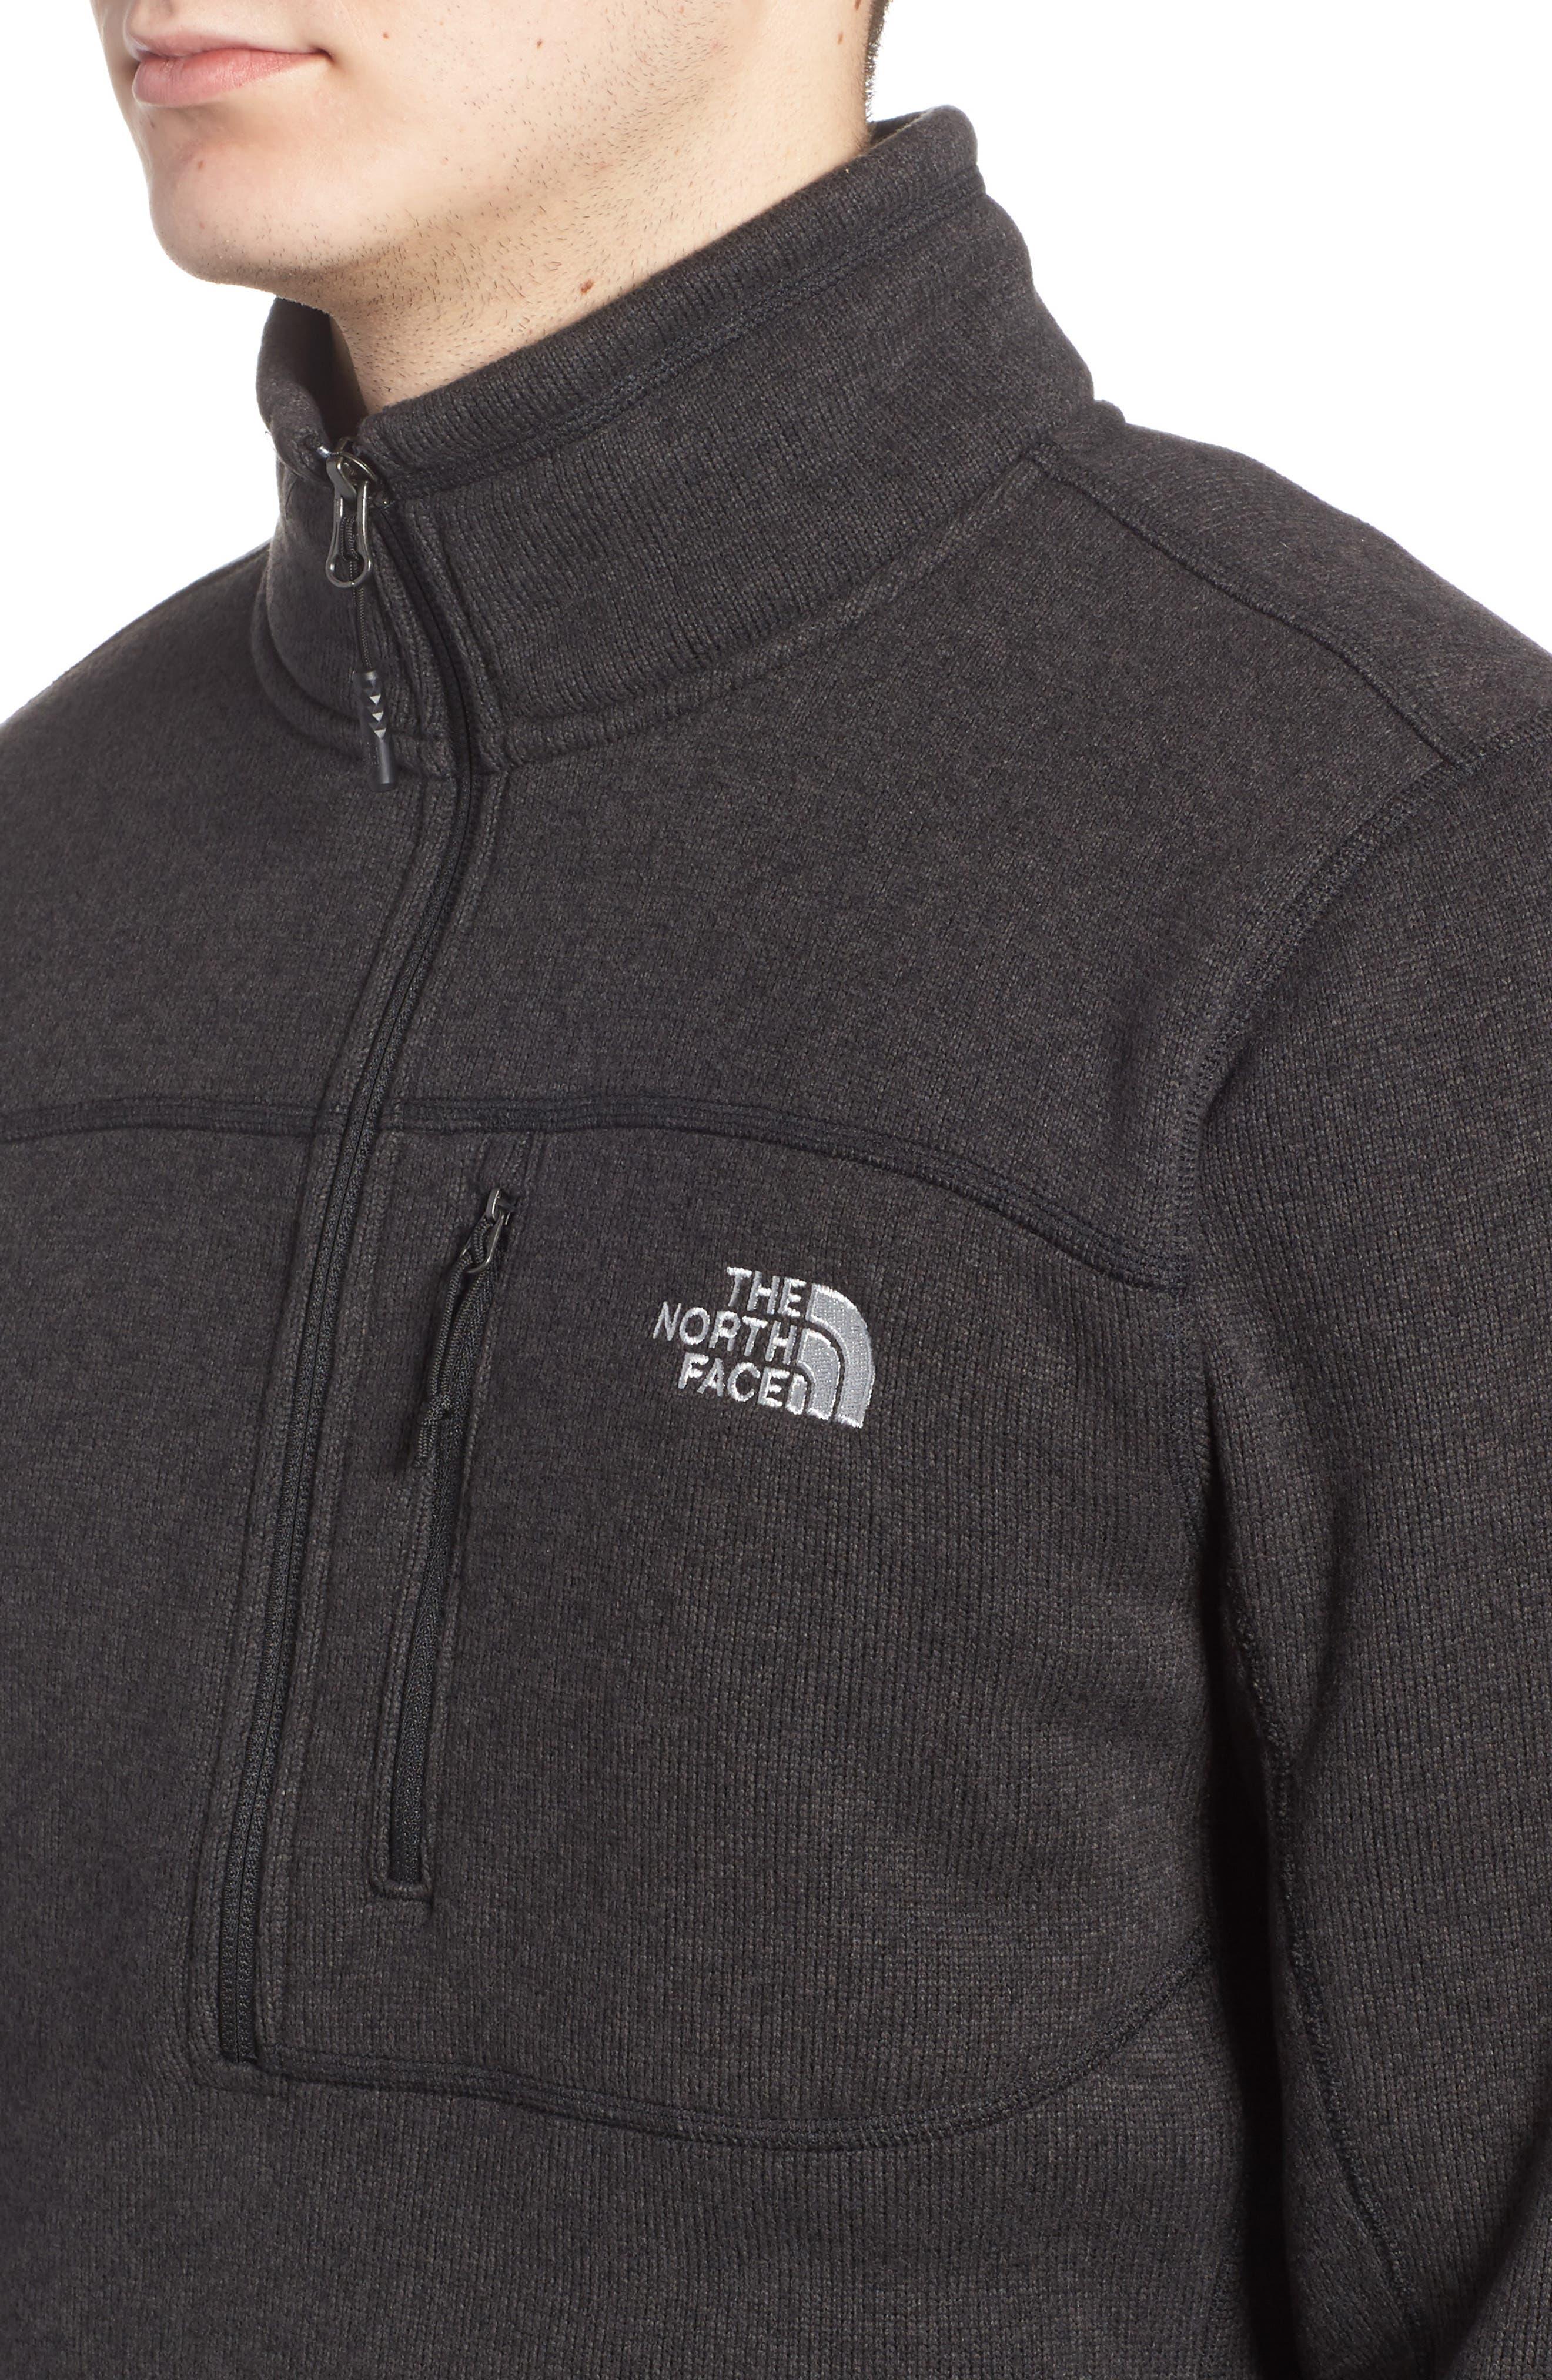 Gordon Lyons Quarter-Zip Fleece Jacket,                             Alternate thumbnail 4, color,                             BLACK HEATHER